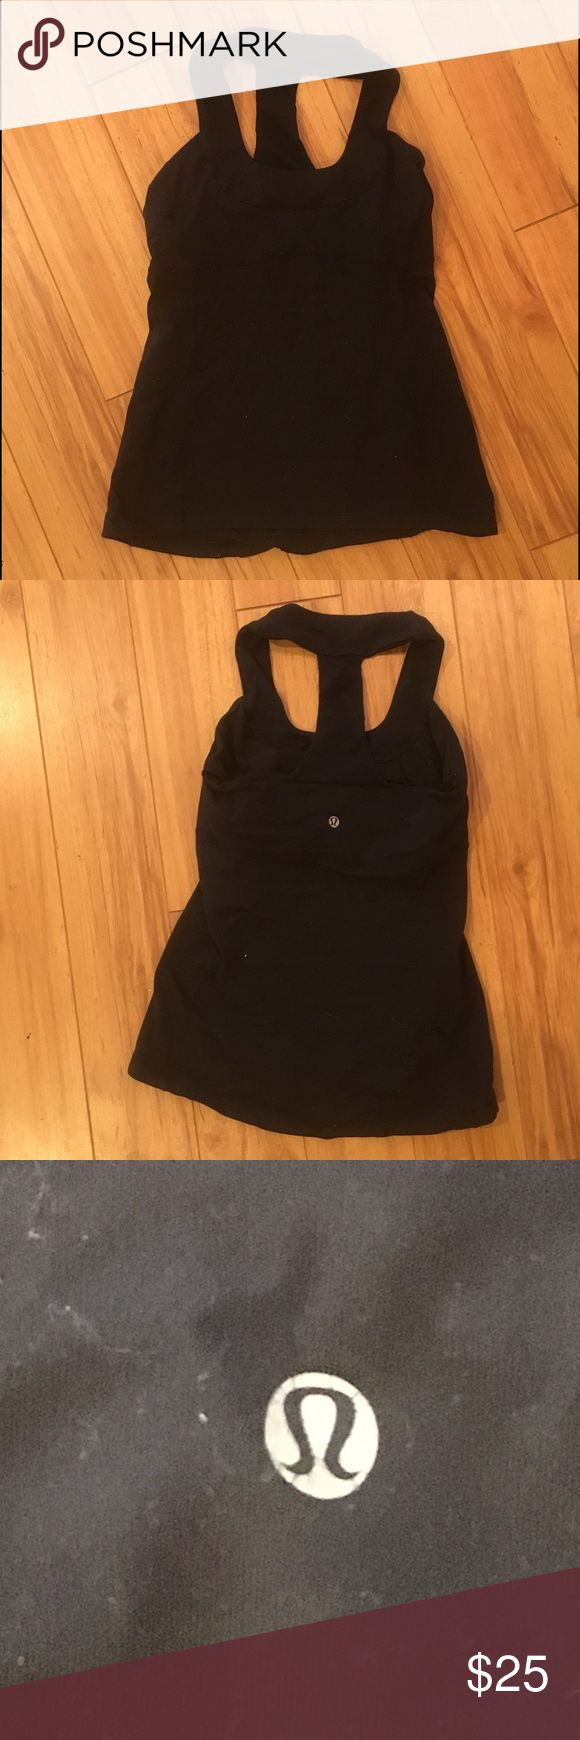 Lululemon Top - Size 6 Black Lulu top. No rips or stains. lululemon athletica Tops Tank Tops